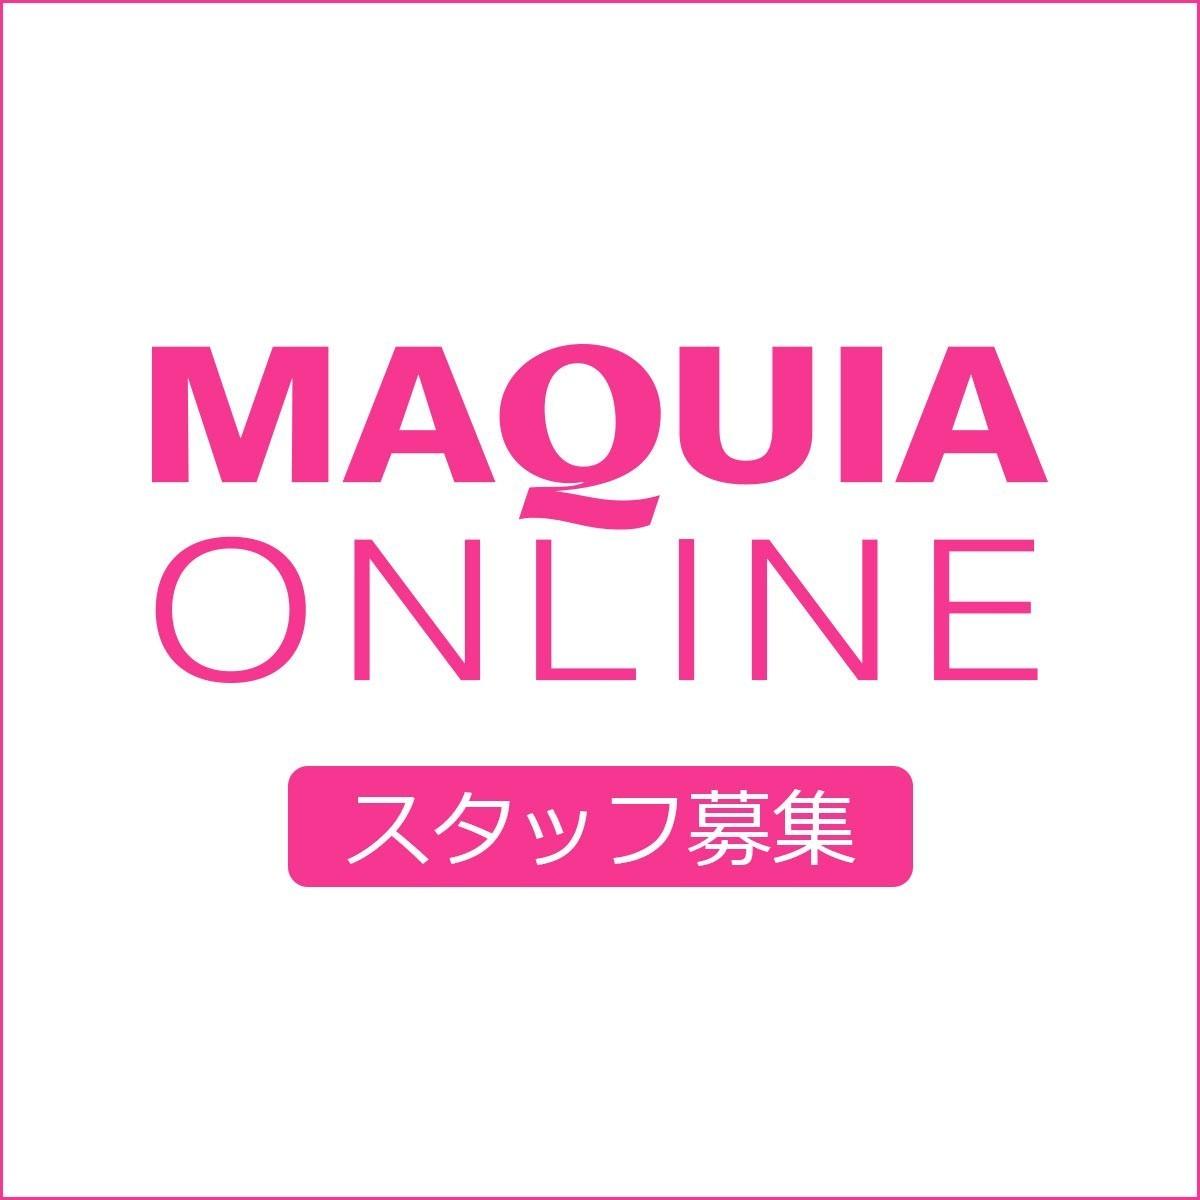 MAQUIA ONLINE ウェブスタッフを募集!